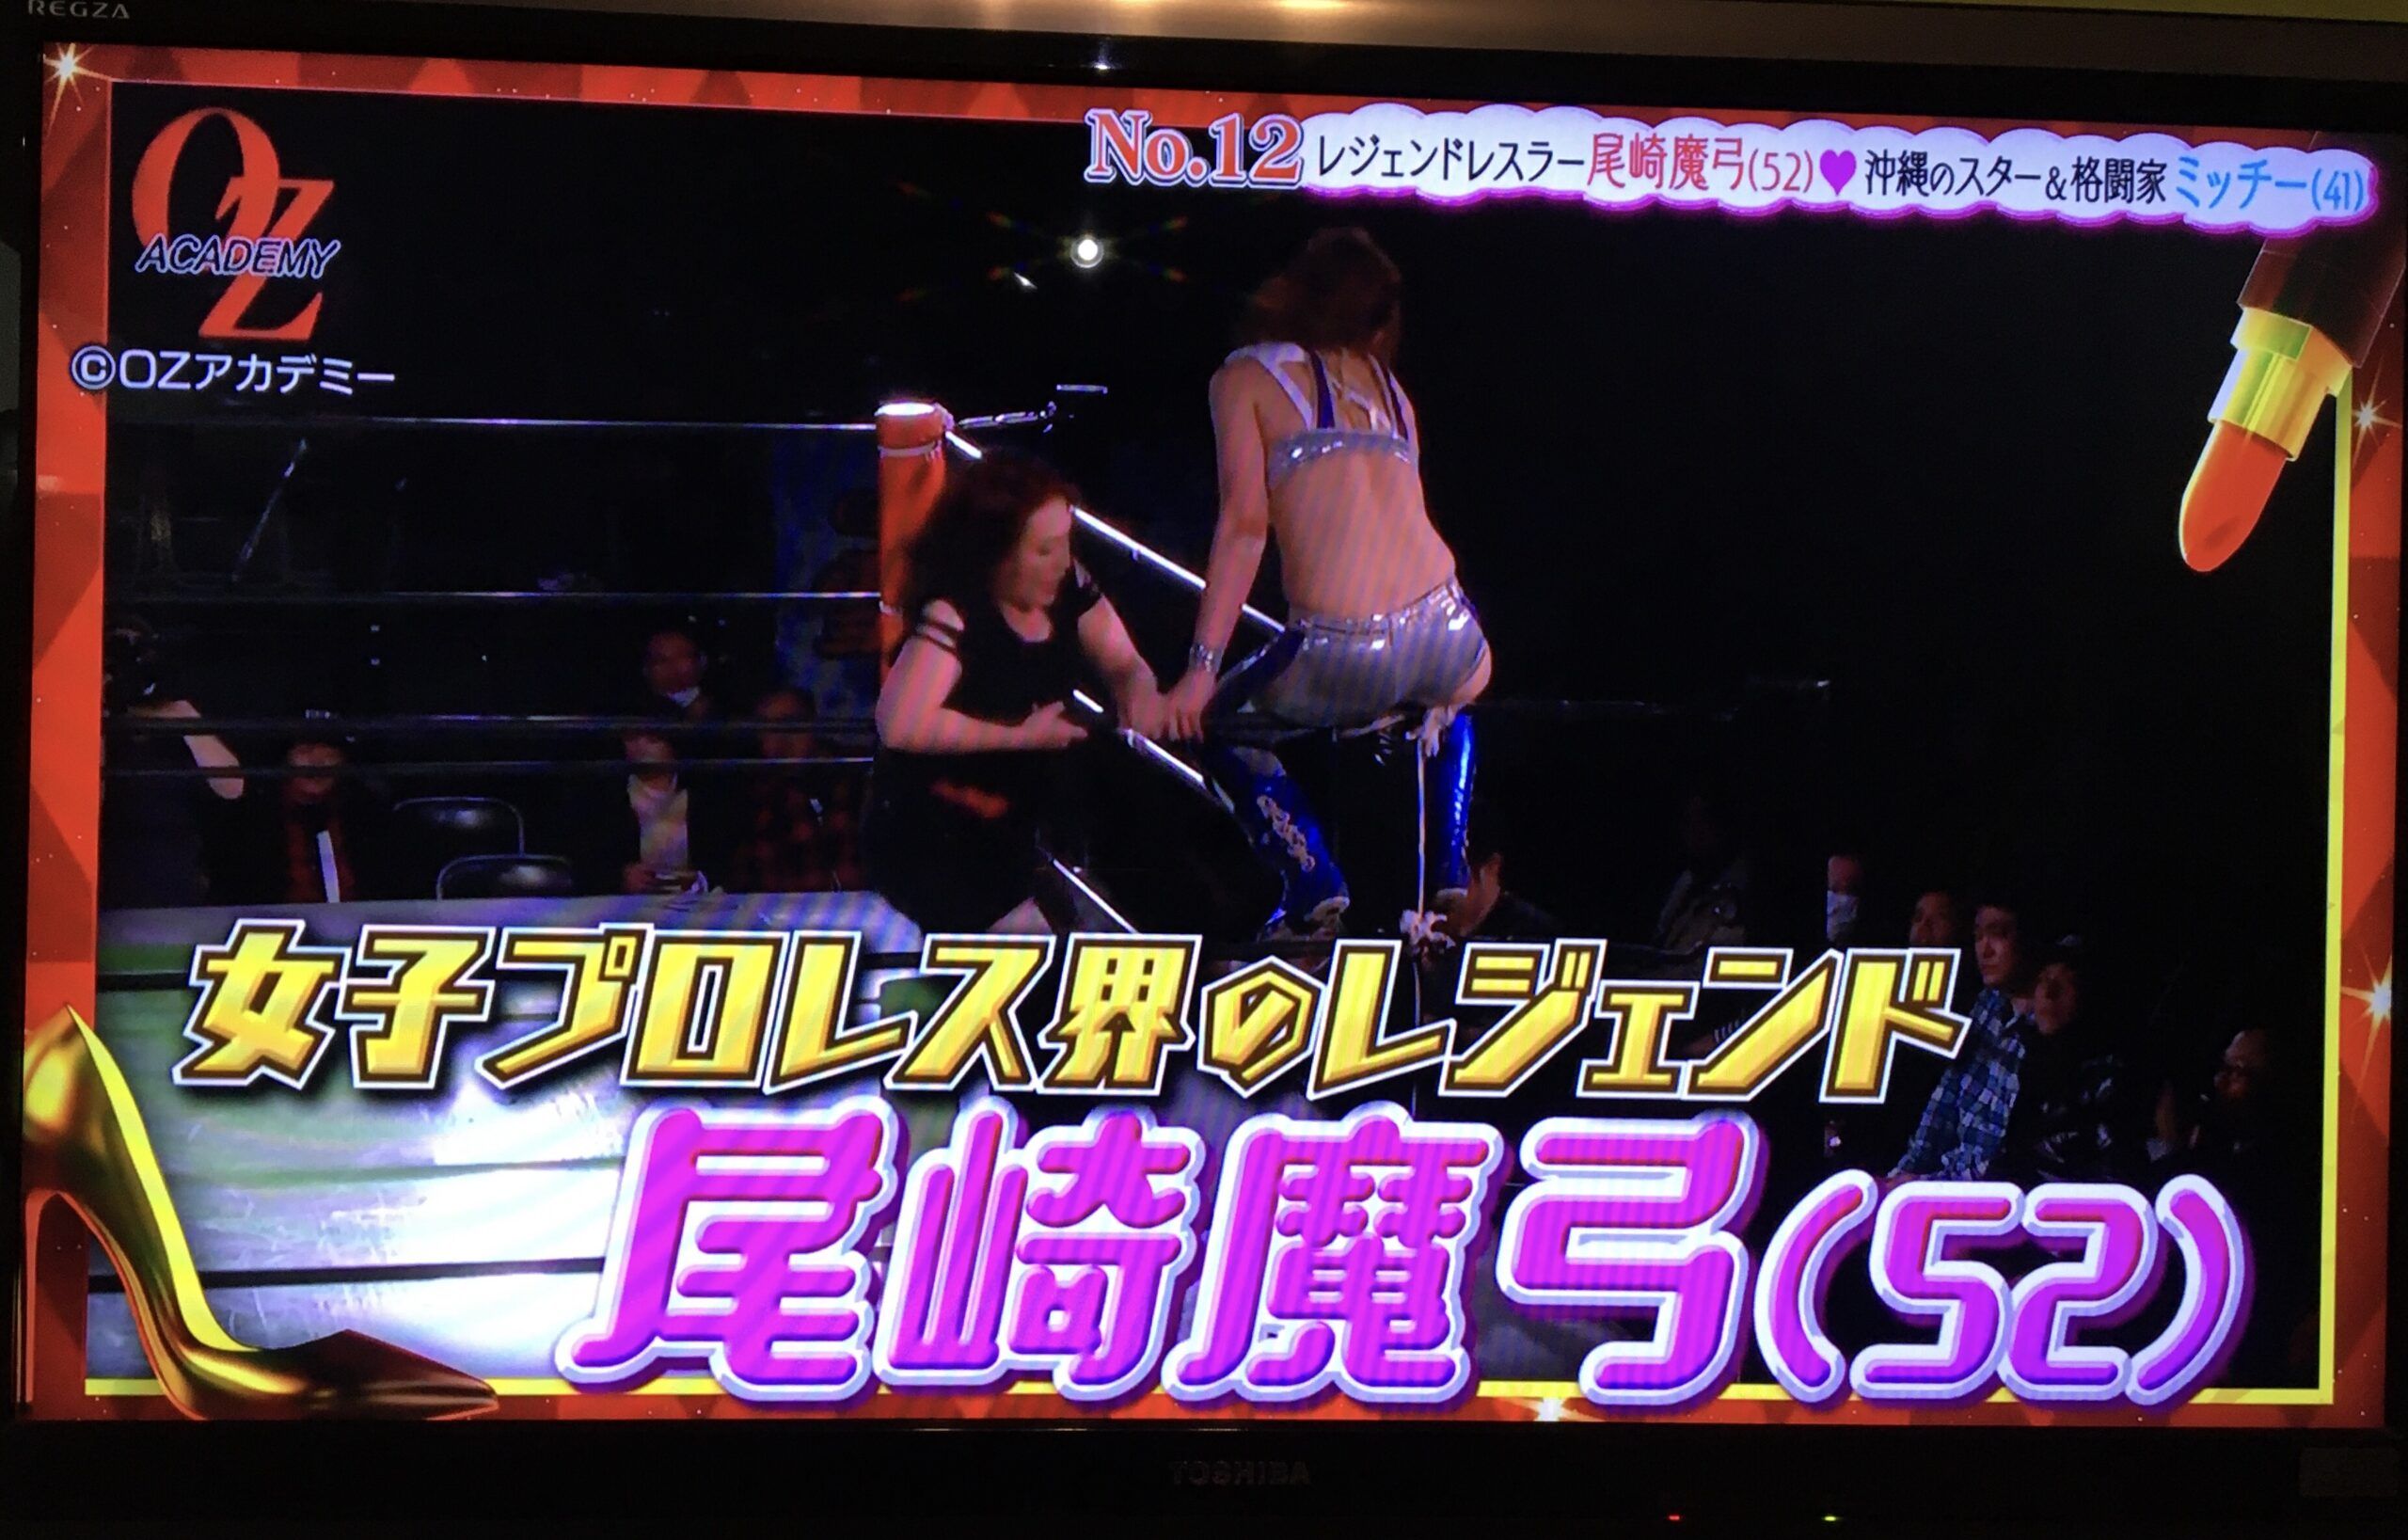 OZアカデミー尾崎魔弓選手のTBSラブ子さん出演映像写真